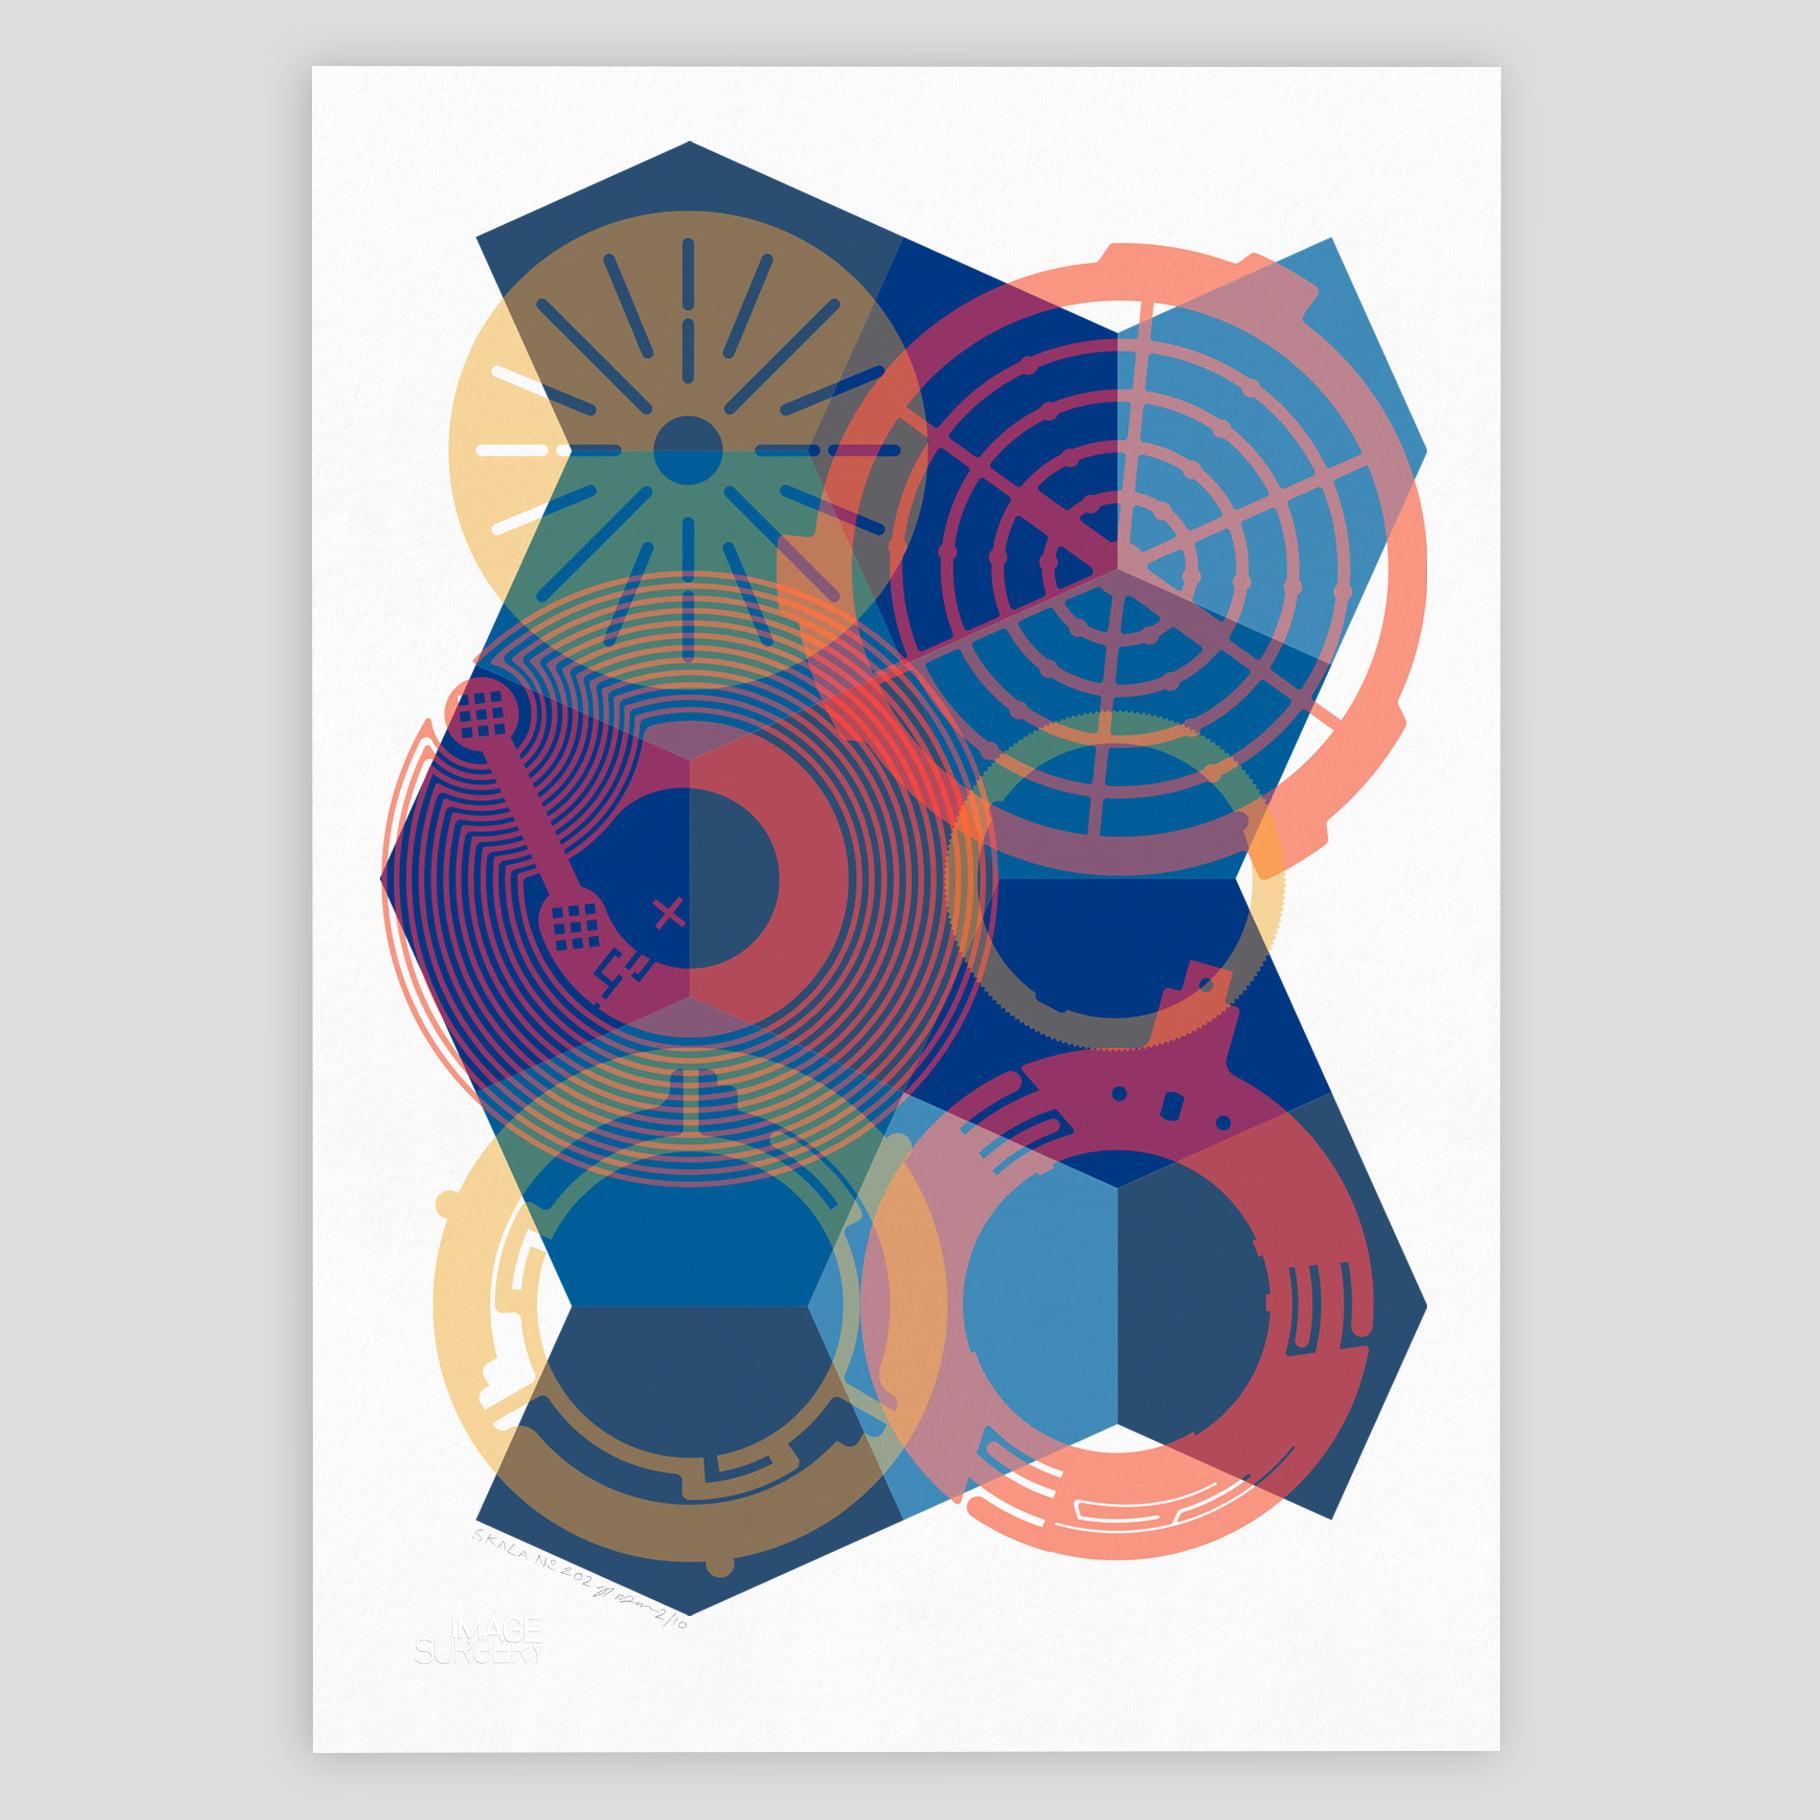 SKALA Nº2 geometric abstract print by imagesurgery